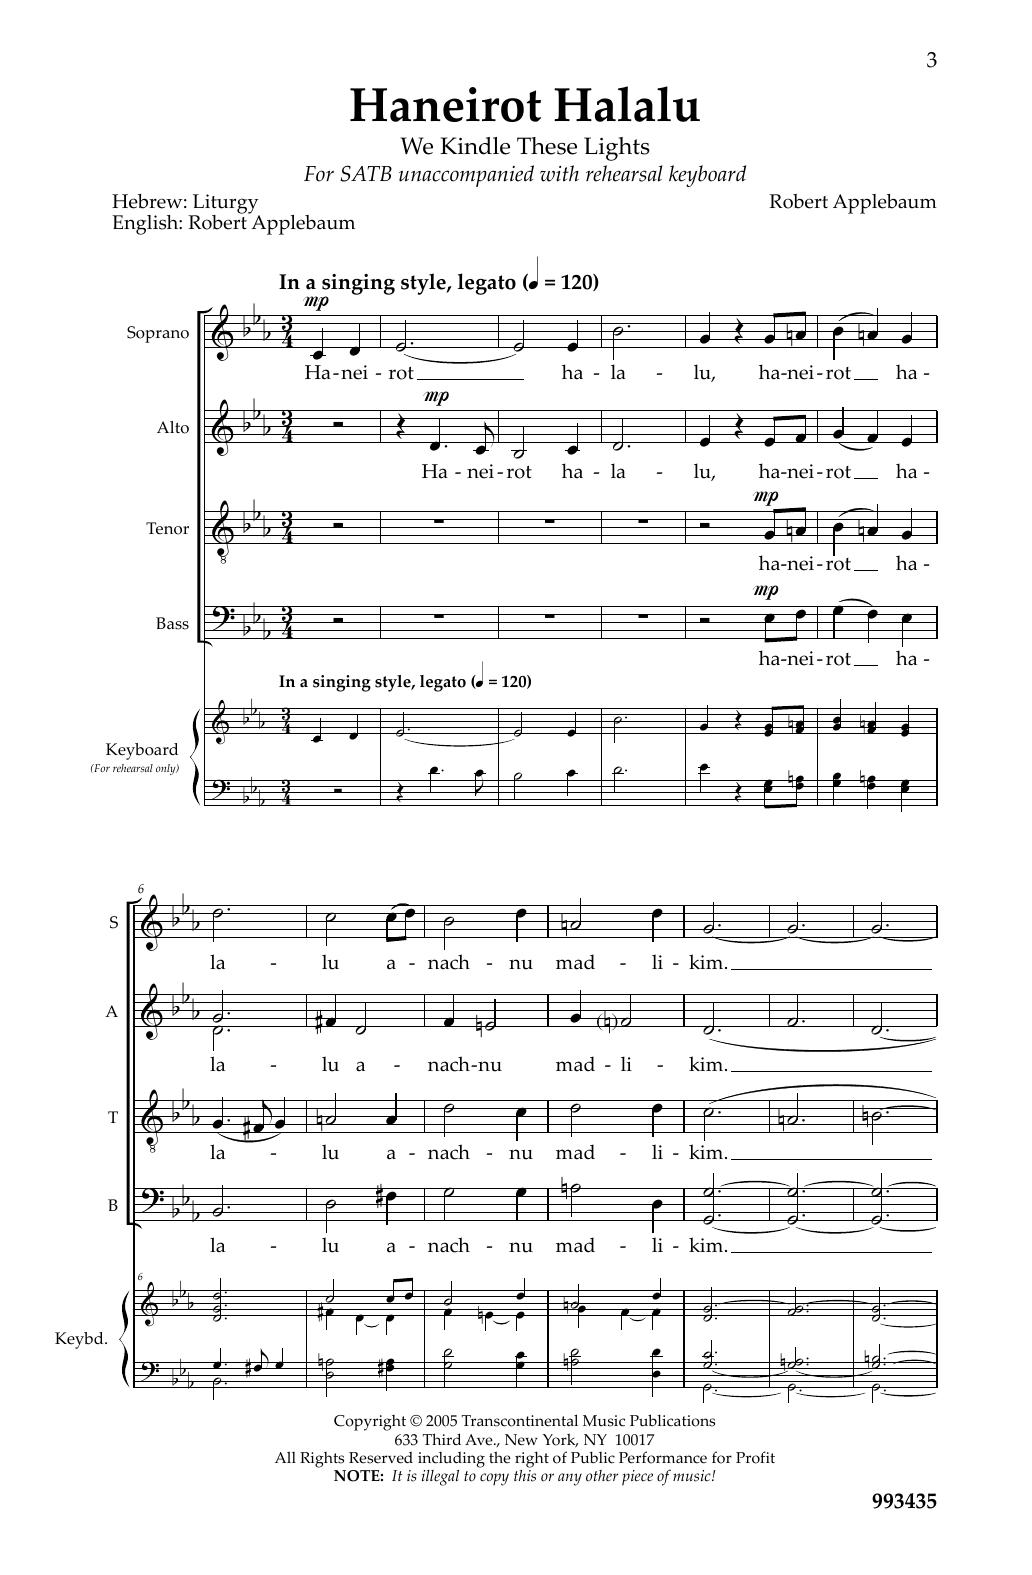 Haneirot Halalu (We Kindle These Lights) Sheet Music